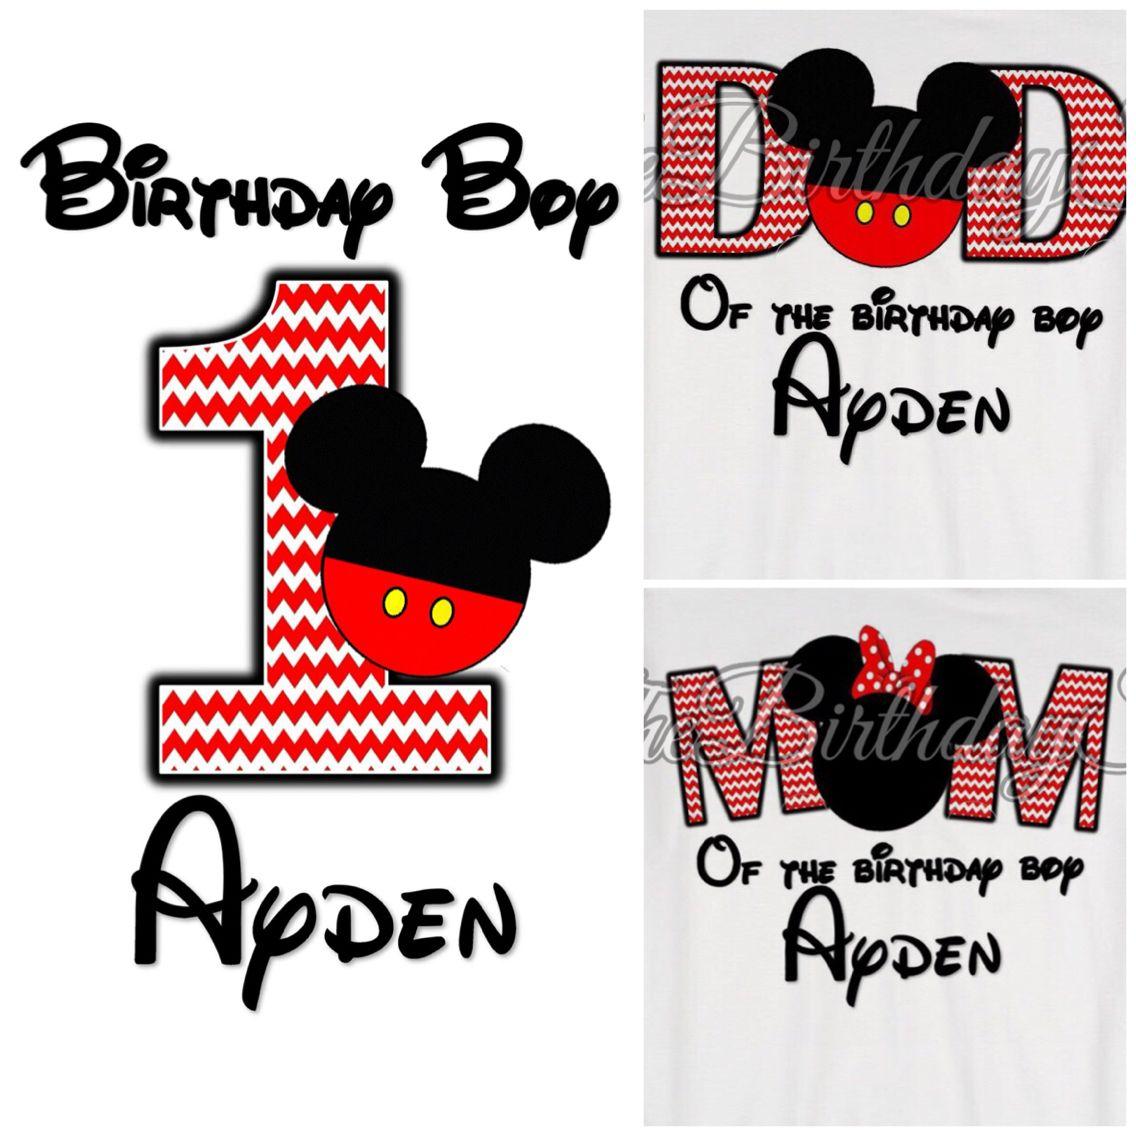 Matching shirts, Mickey Mouse, Minnie Mouse, Disneyland